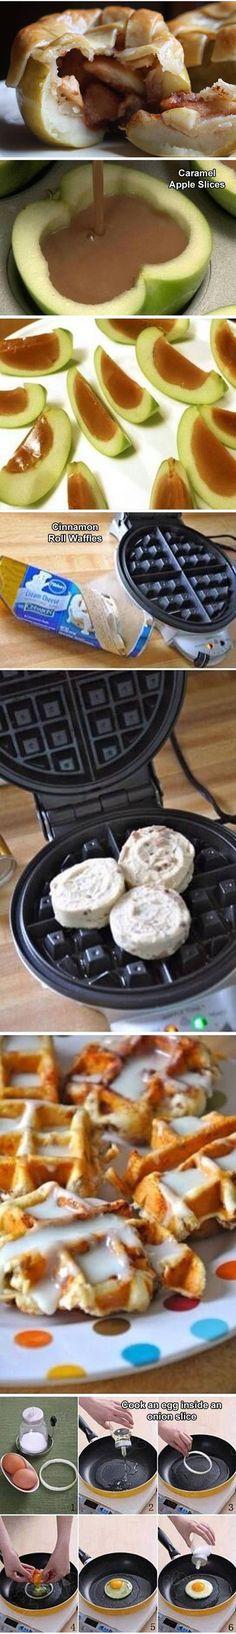 funny-cook-food-hacks-fruits-cookies